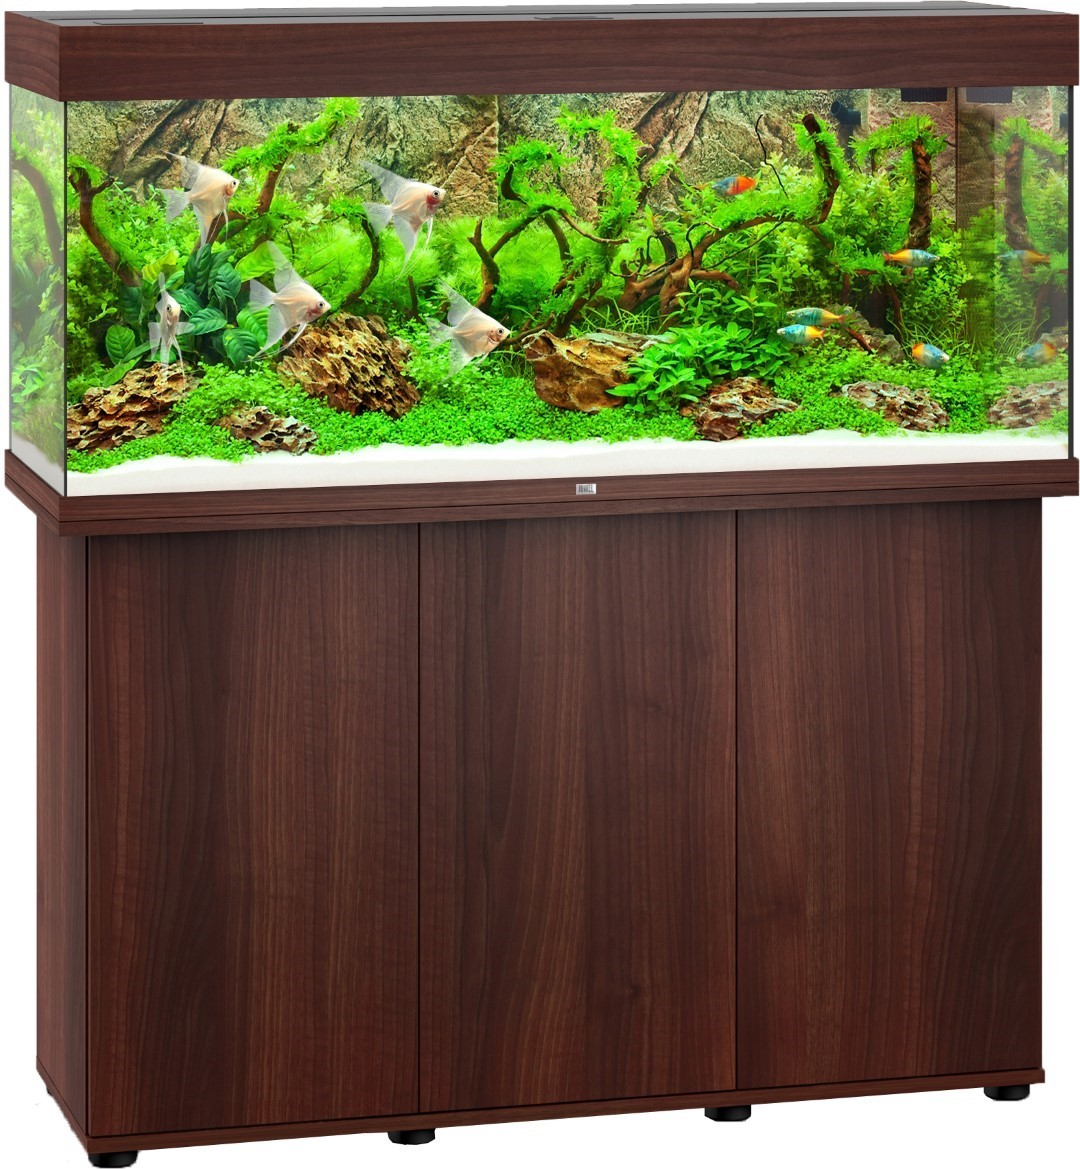 Juwel aquarium Rio 240 LED met filter donkerbruin